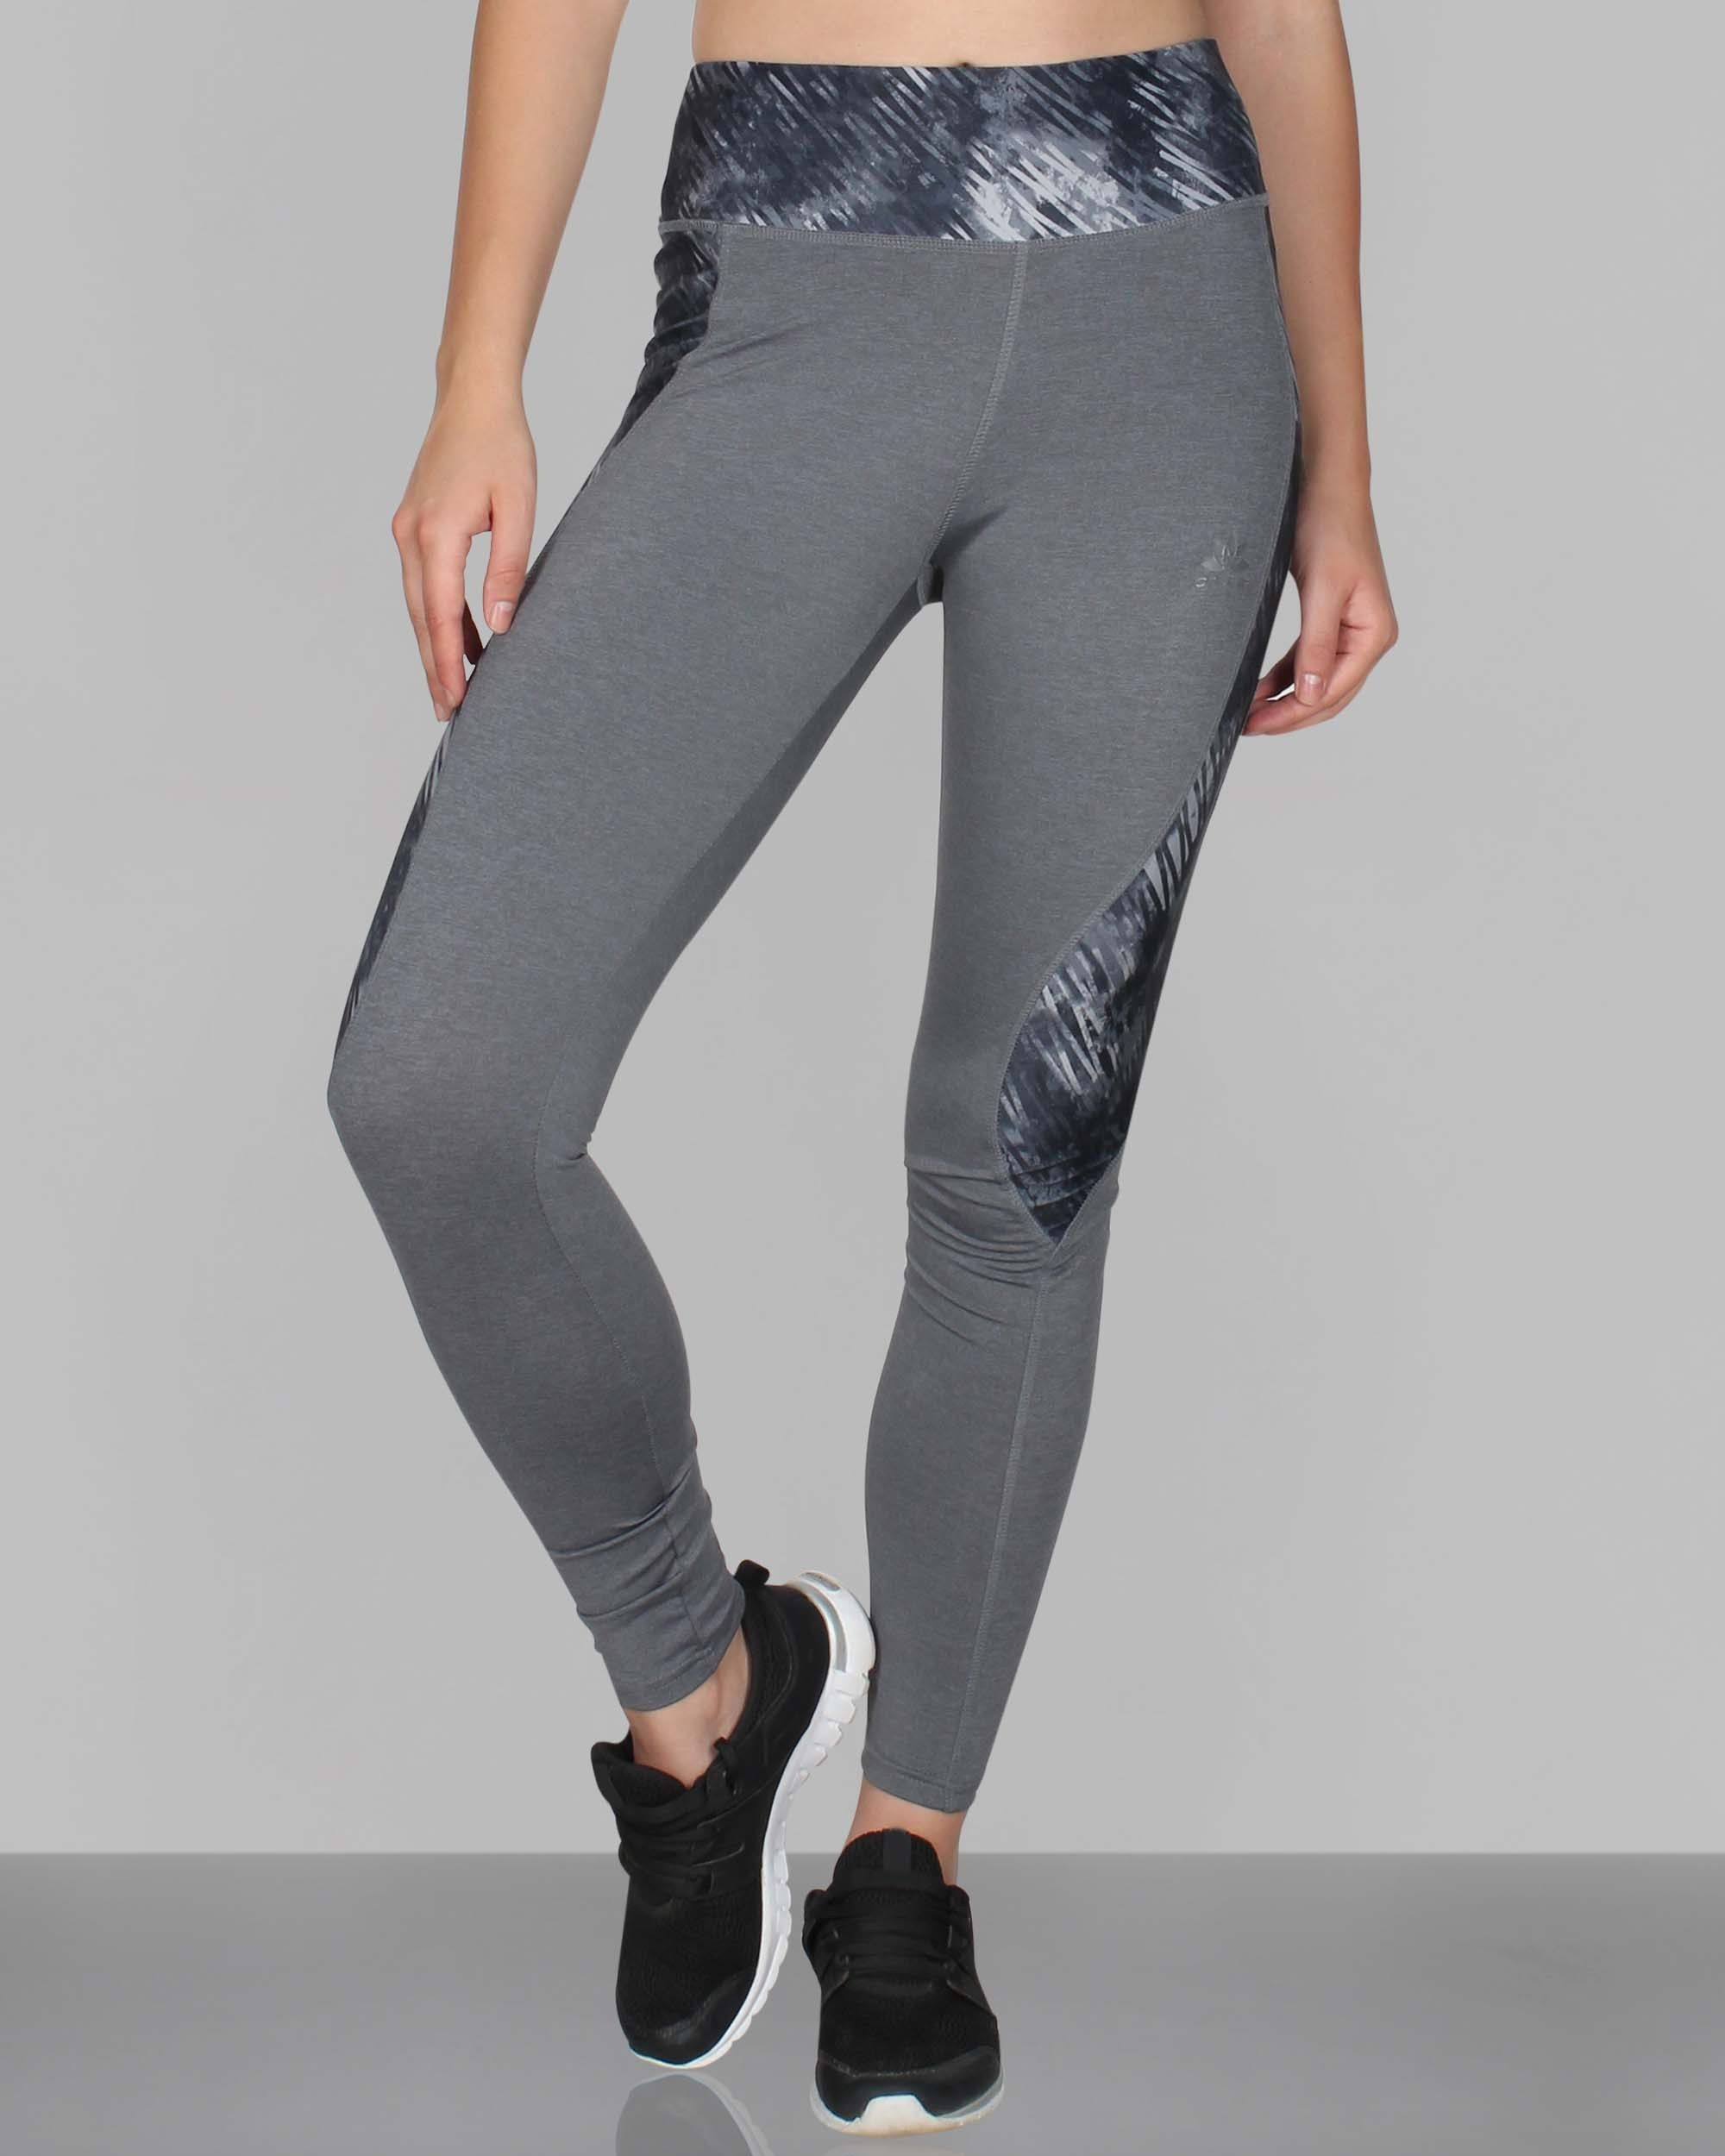 creez.in Buy full sleeve printed leggings and tights